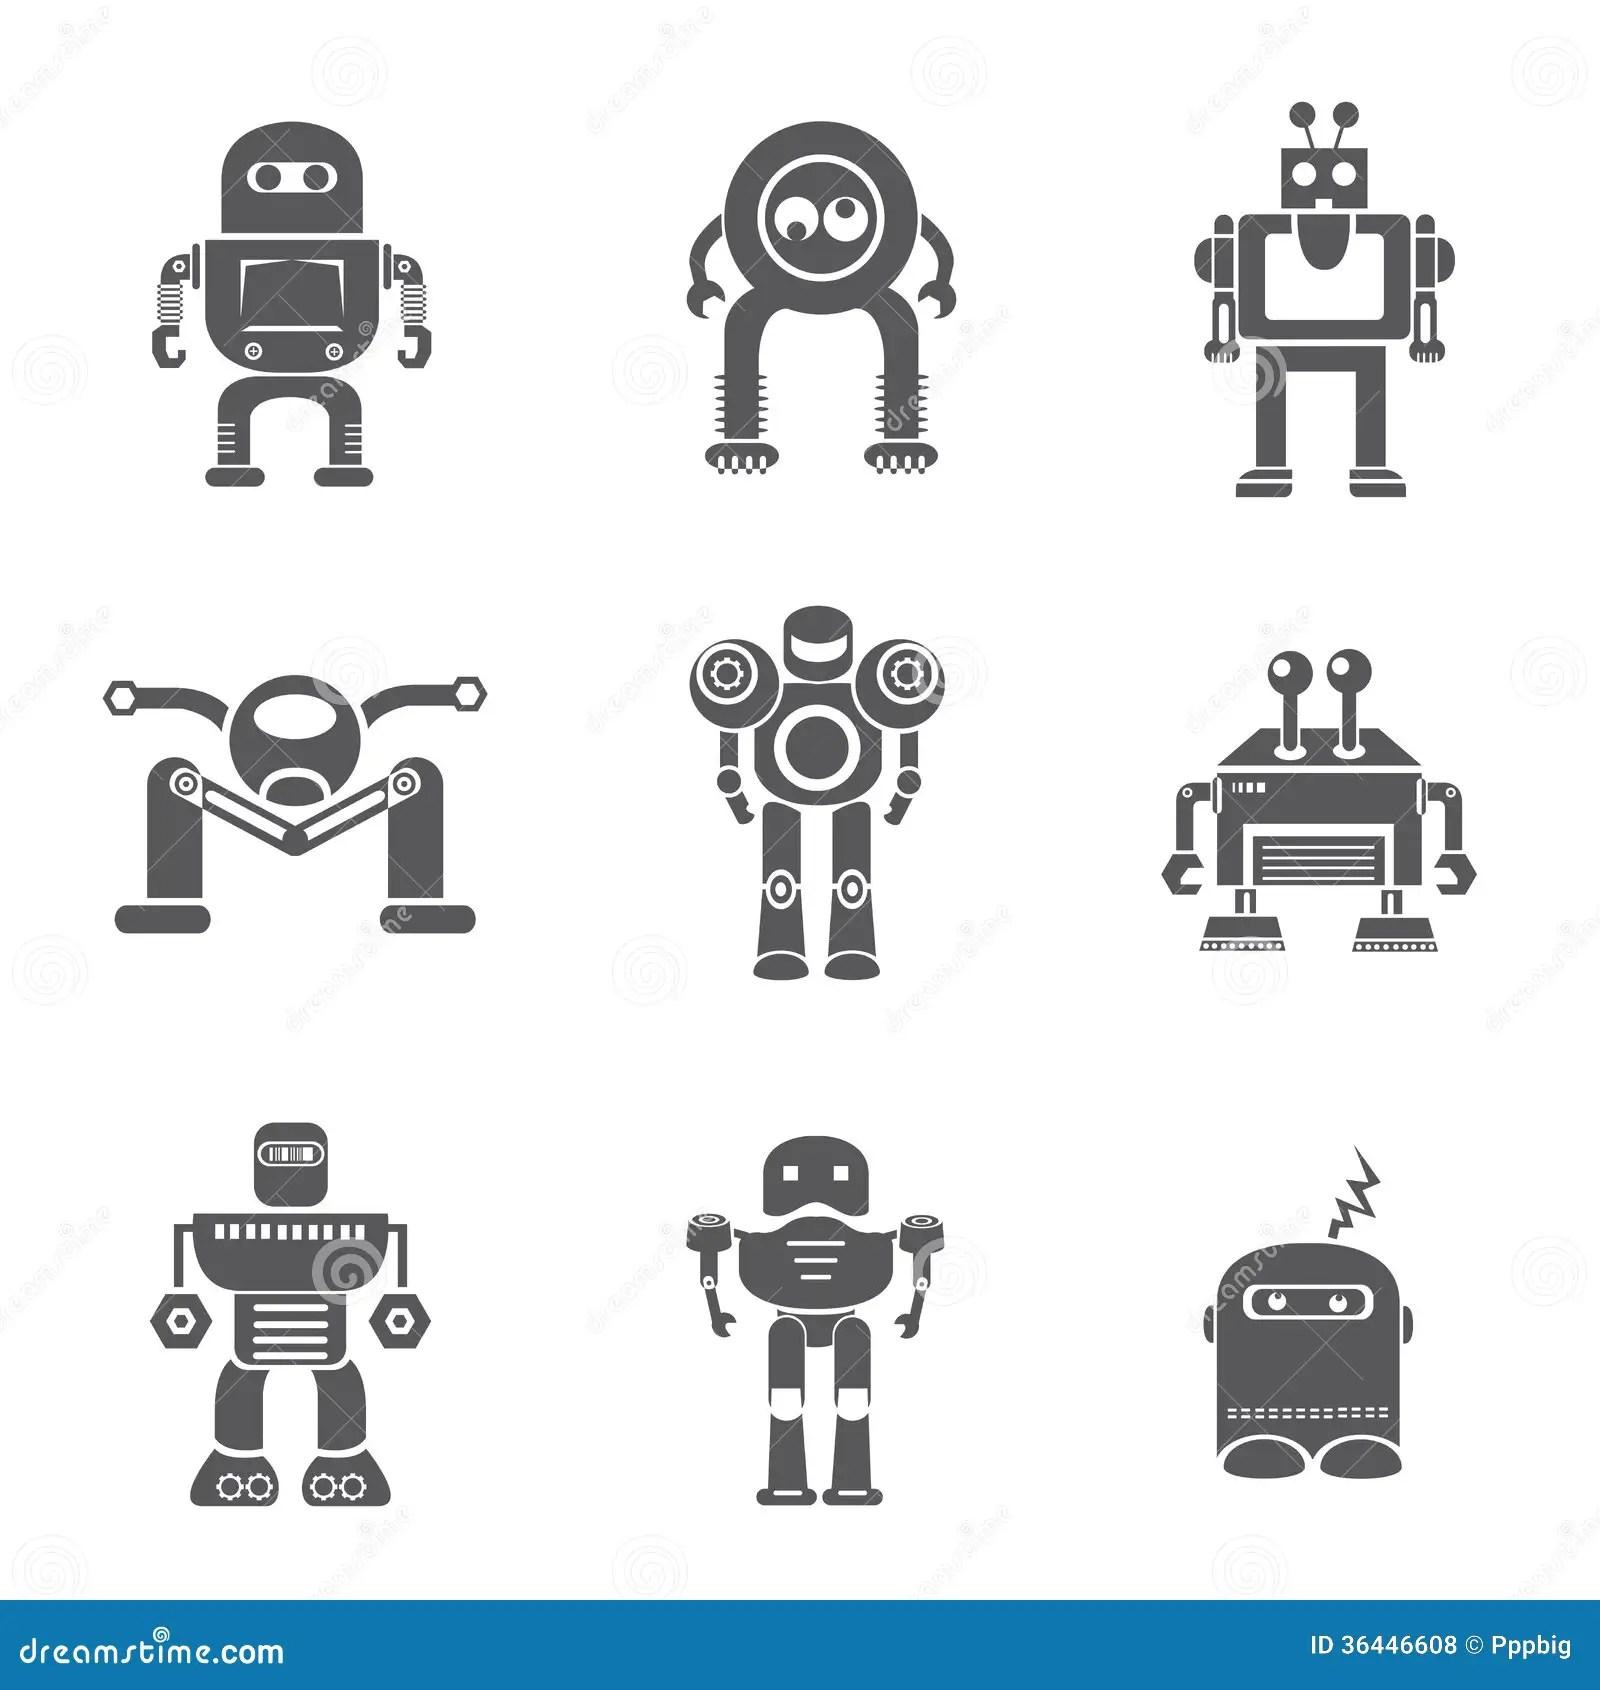 Robot Icons Royalty Free Stock Photos